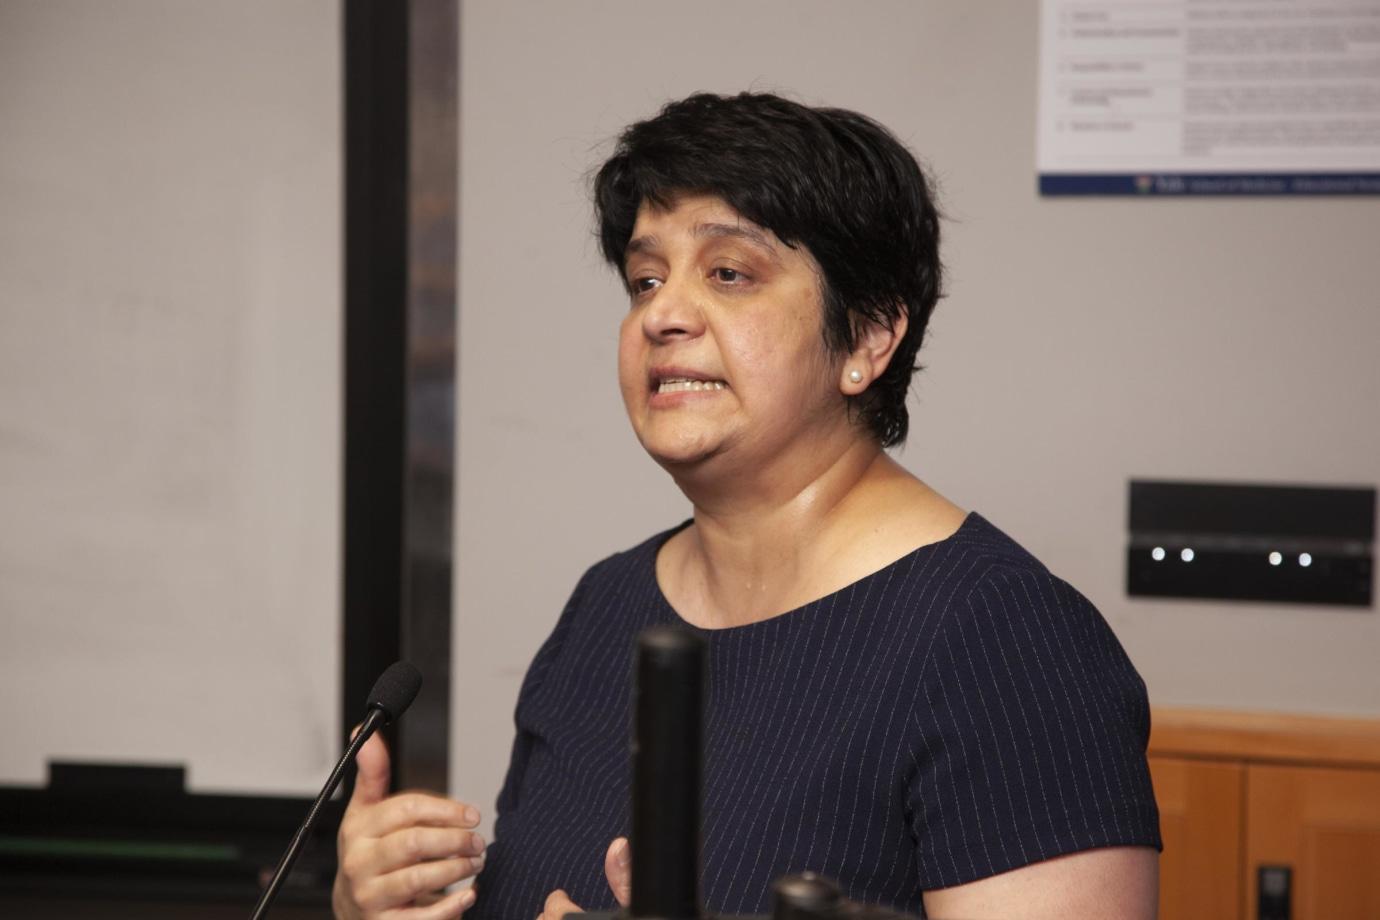 Suchitra Krishnan-Sarin during her lecture to school of medicine alumni